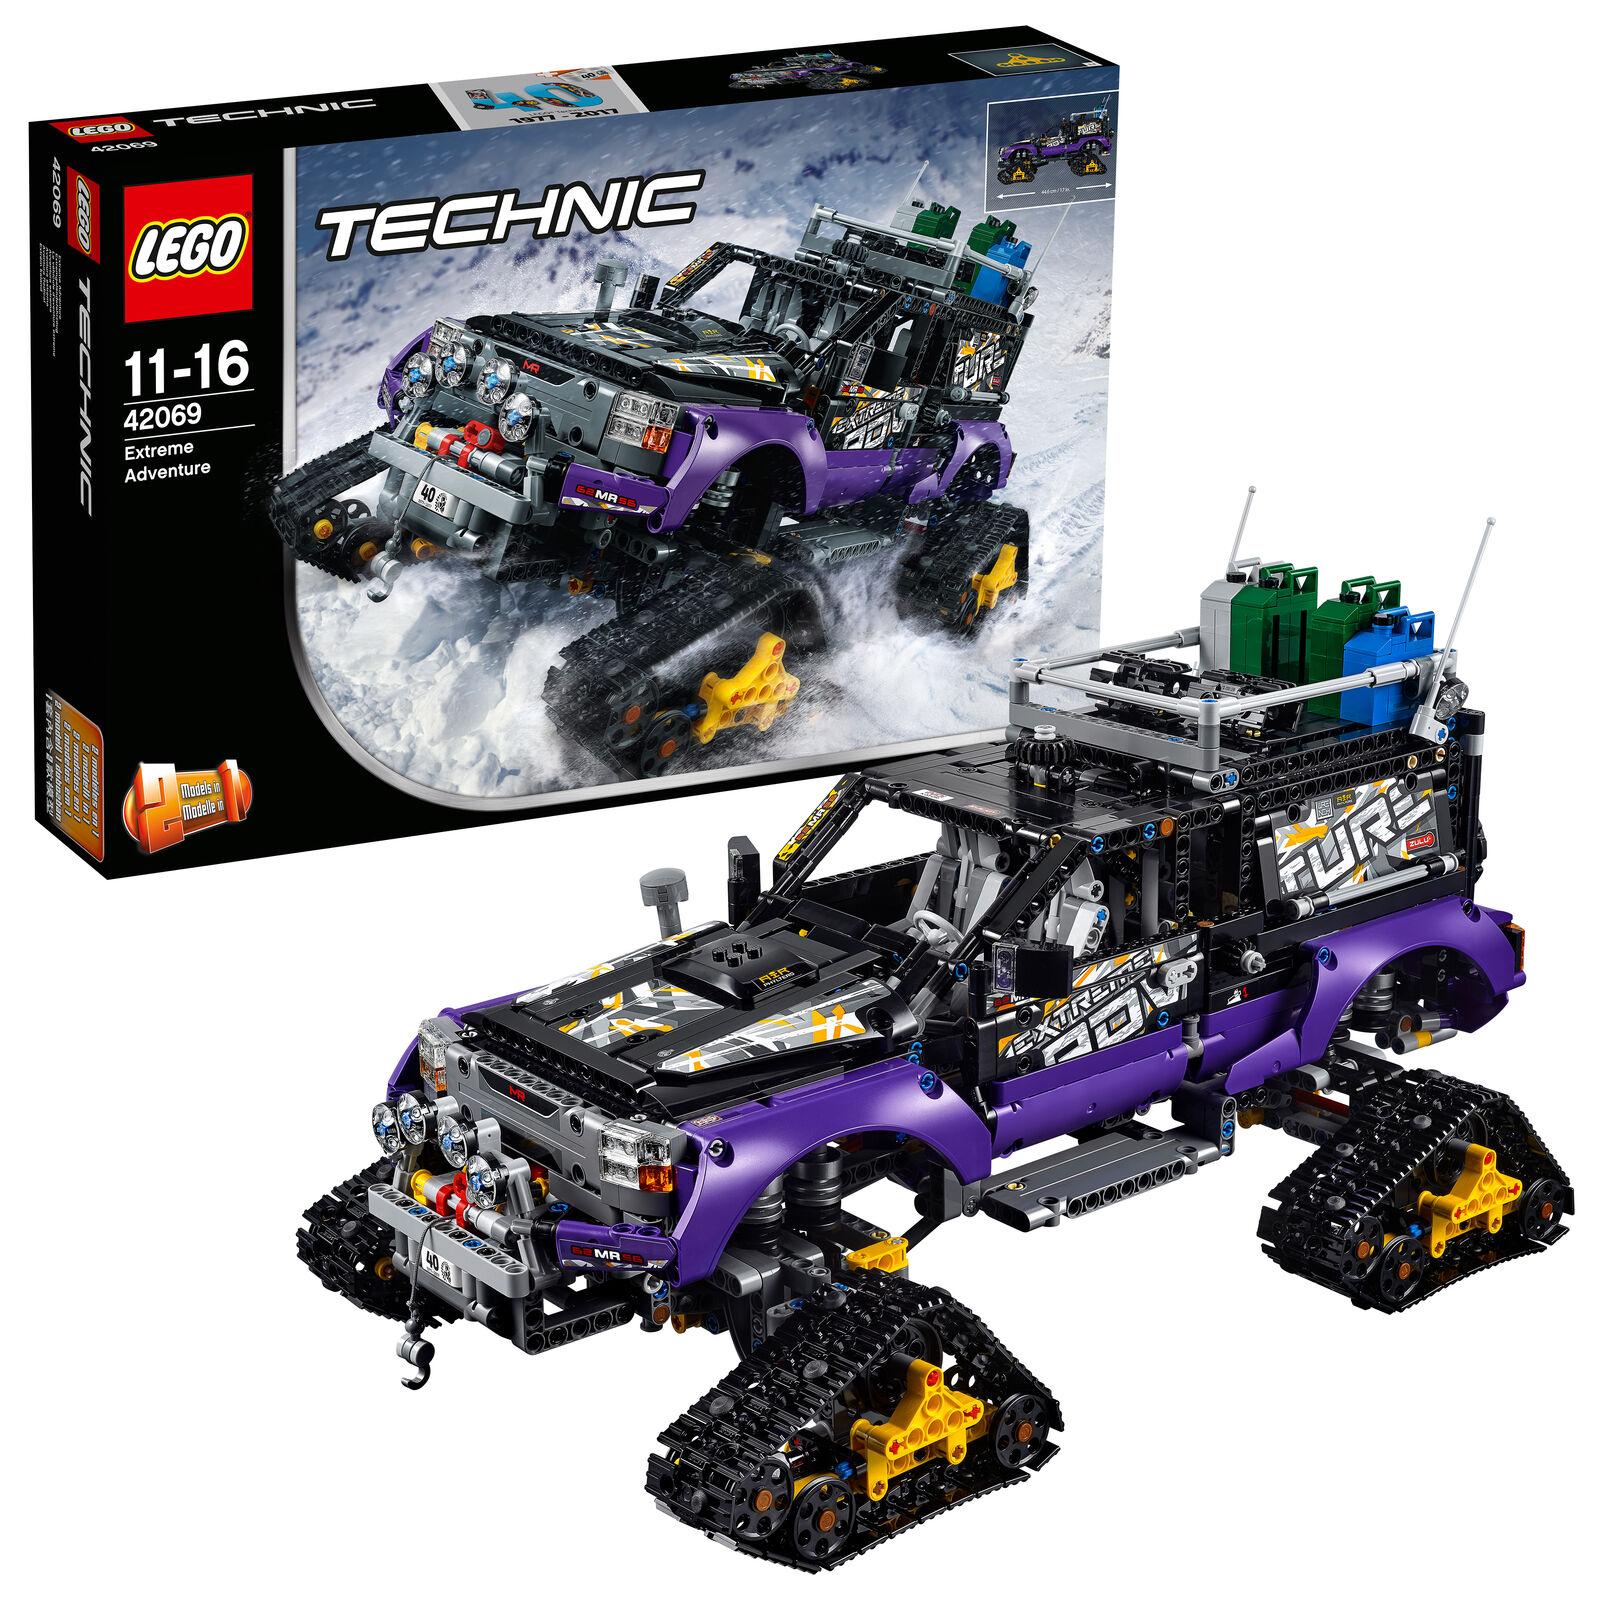 Lego ® Technic-extrêmement terrain Véhicule 42069